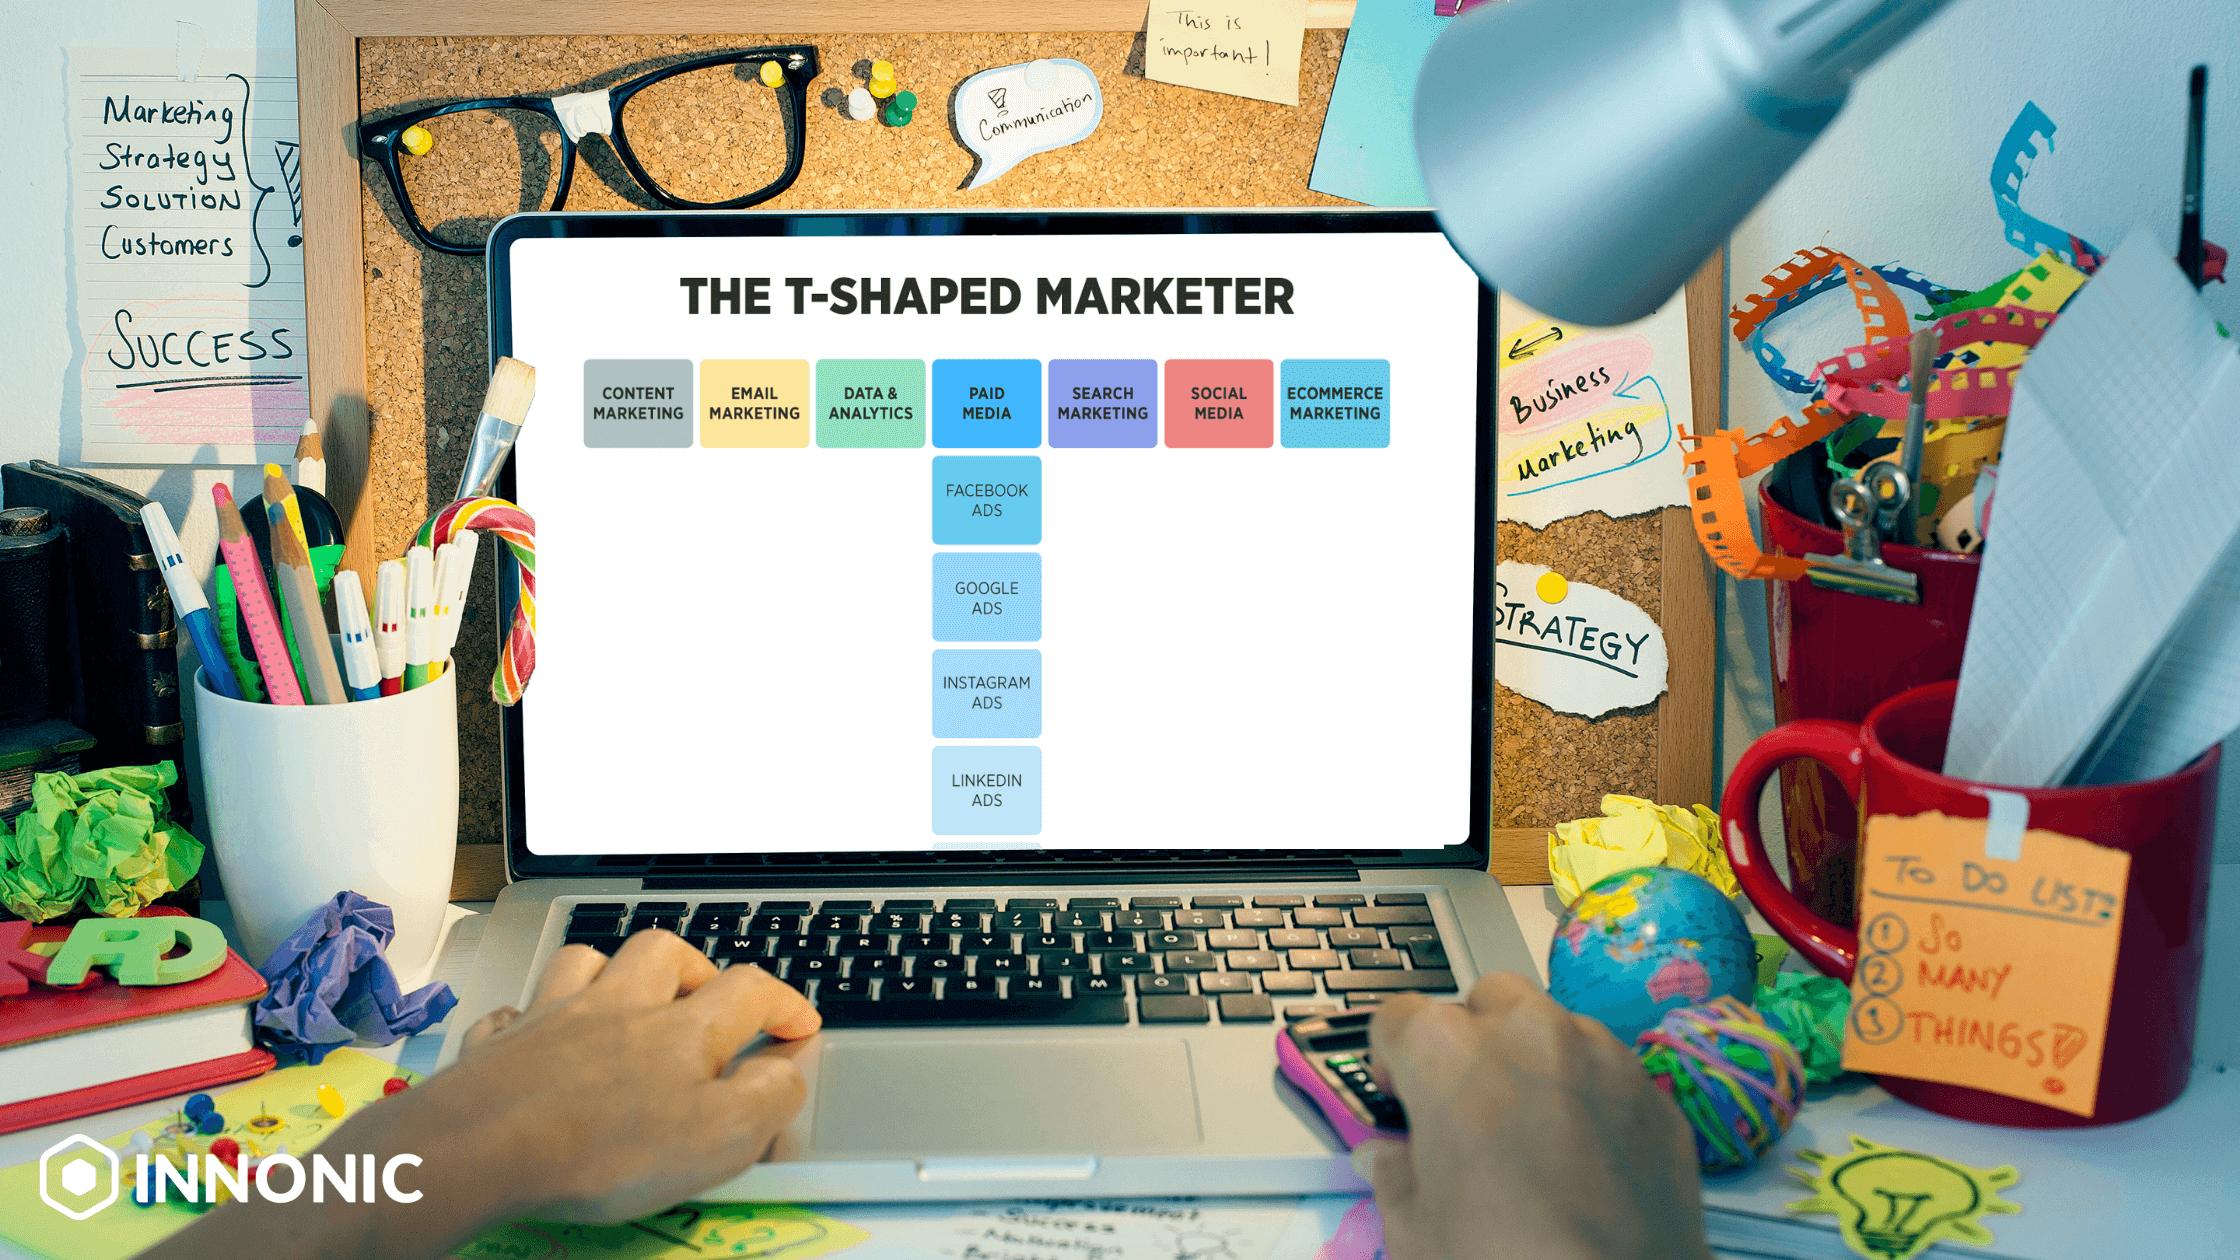 T-shaped marketer Innonic